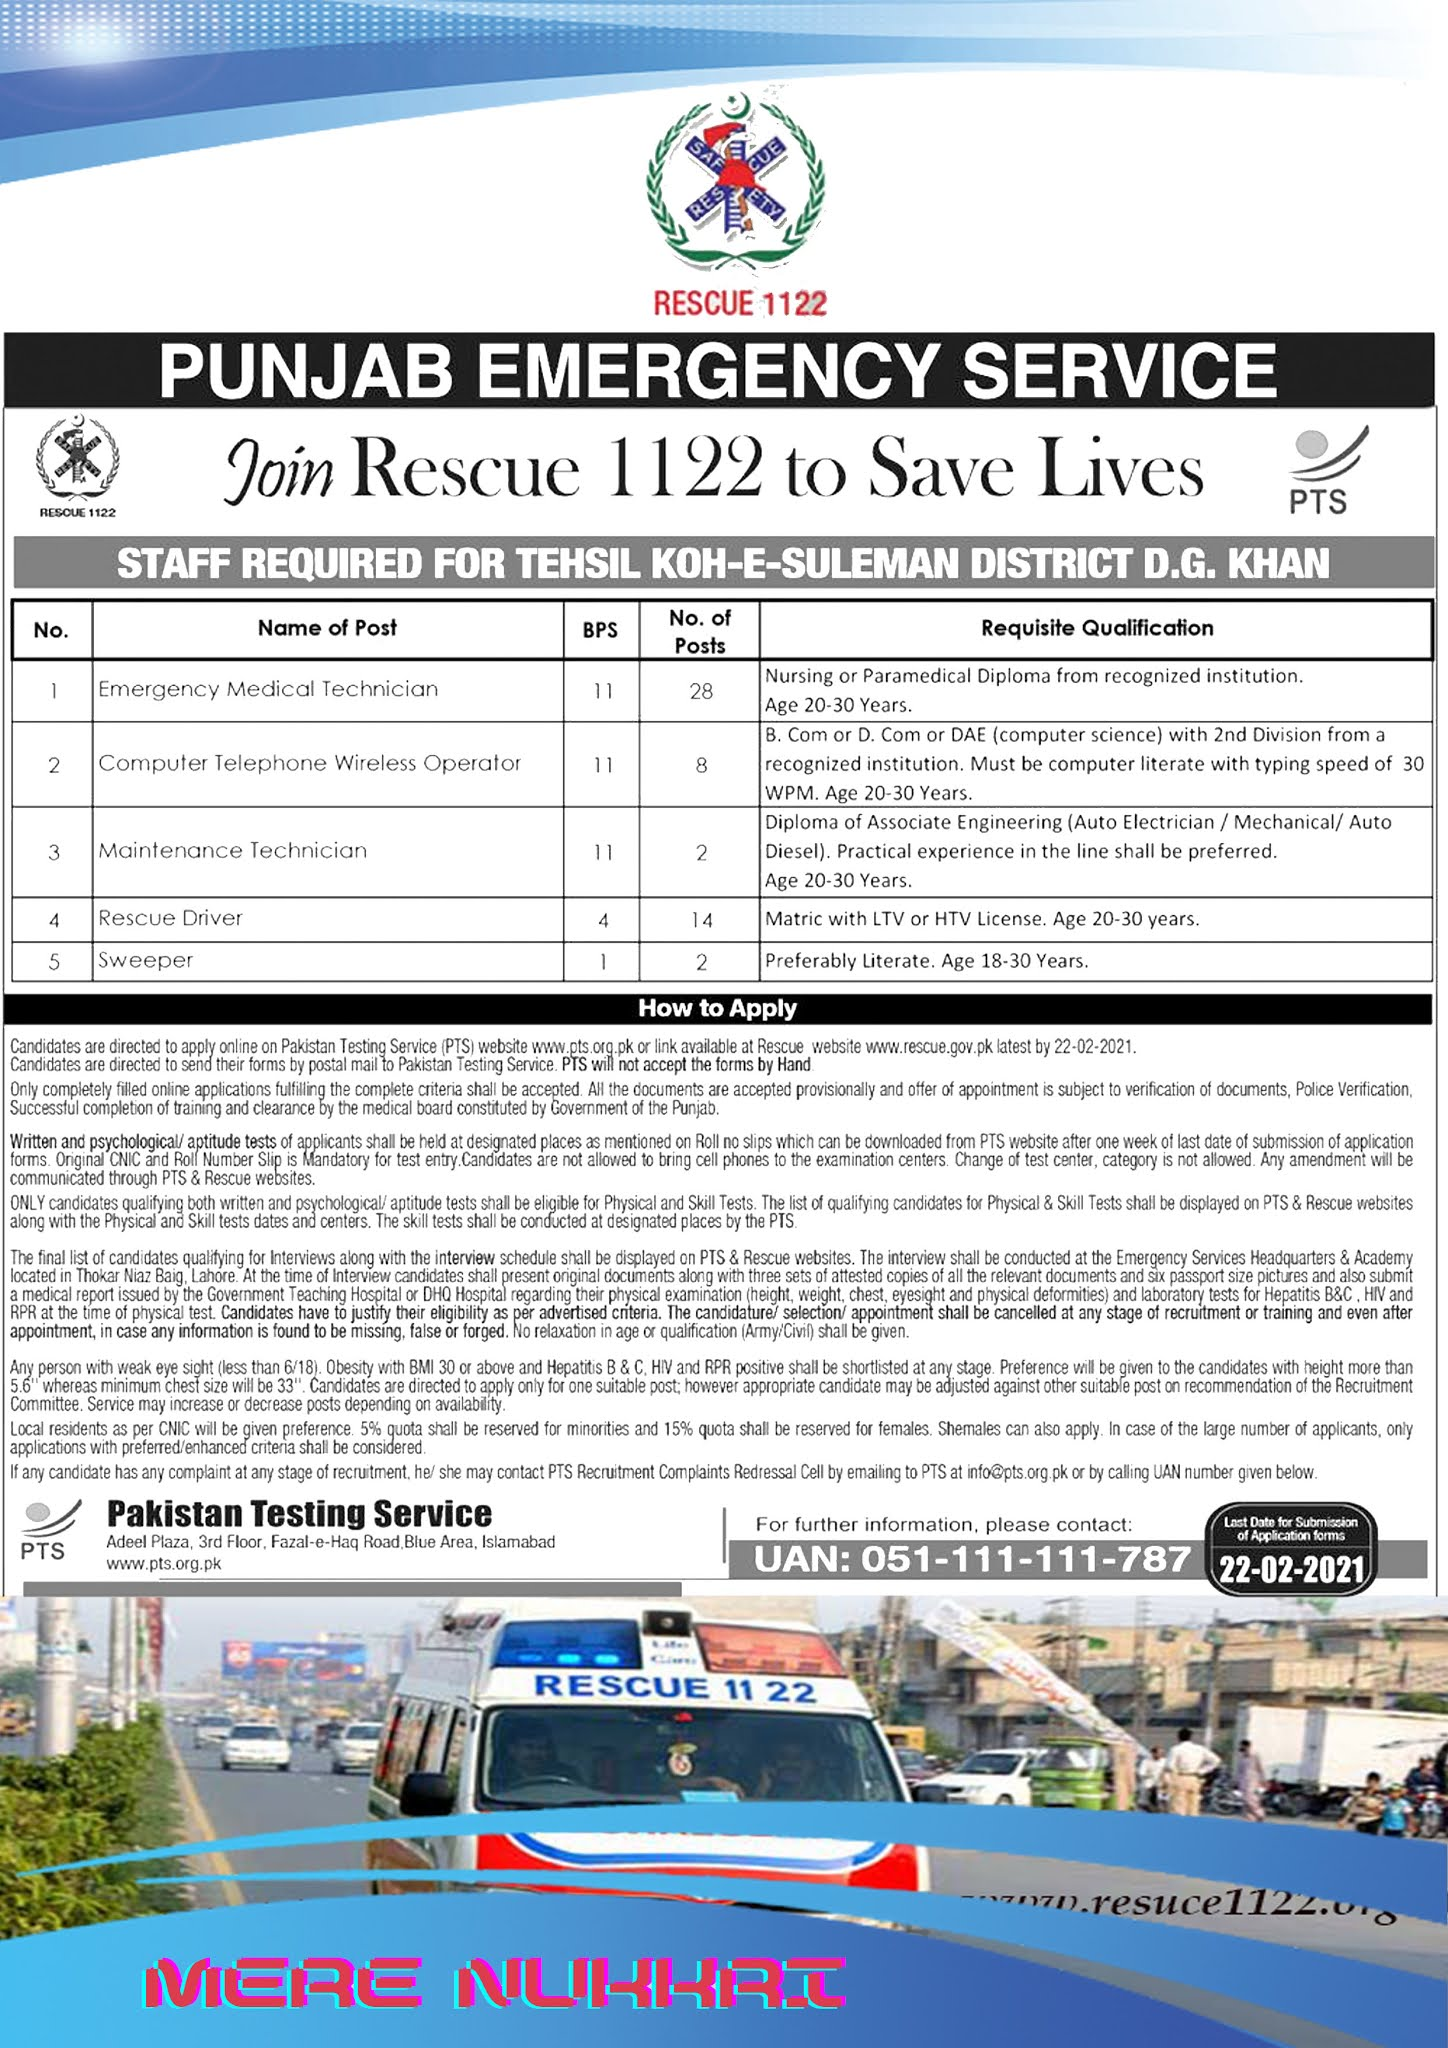 Rescue 1122 Latest Jobs 2021   Punjab Emergency Service   Rescue1122   PTS Jobs   Apply Online   KPK Jobs